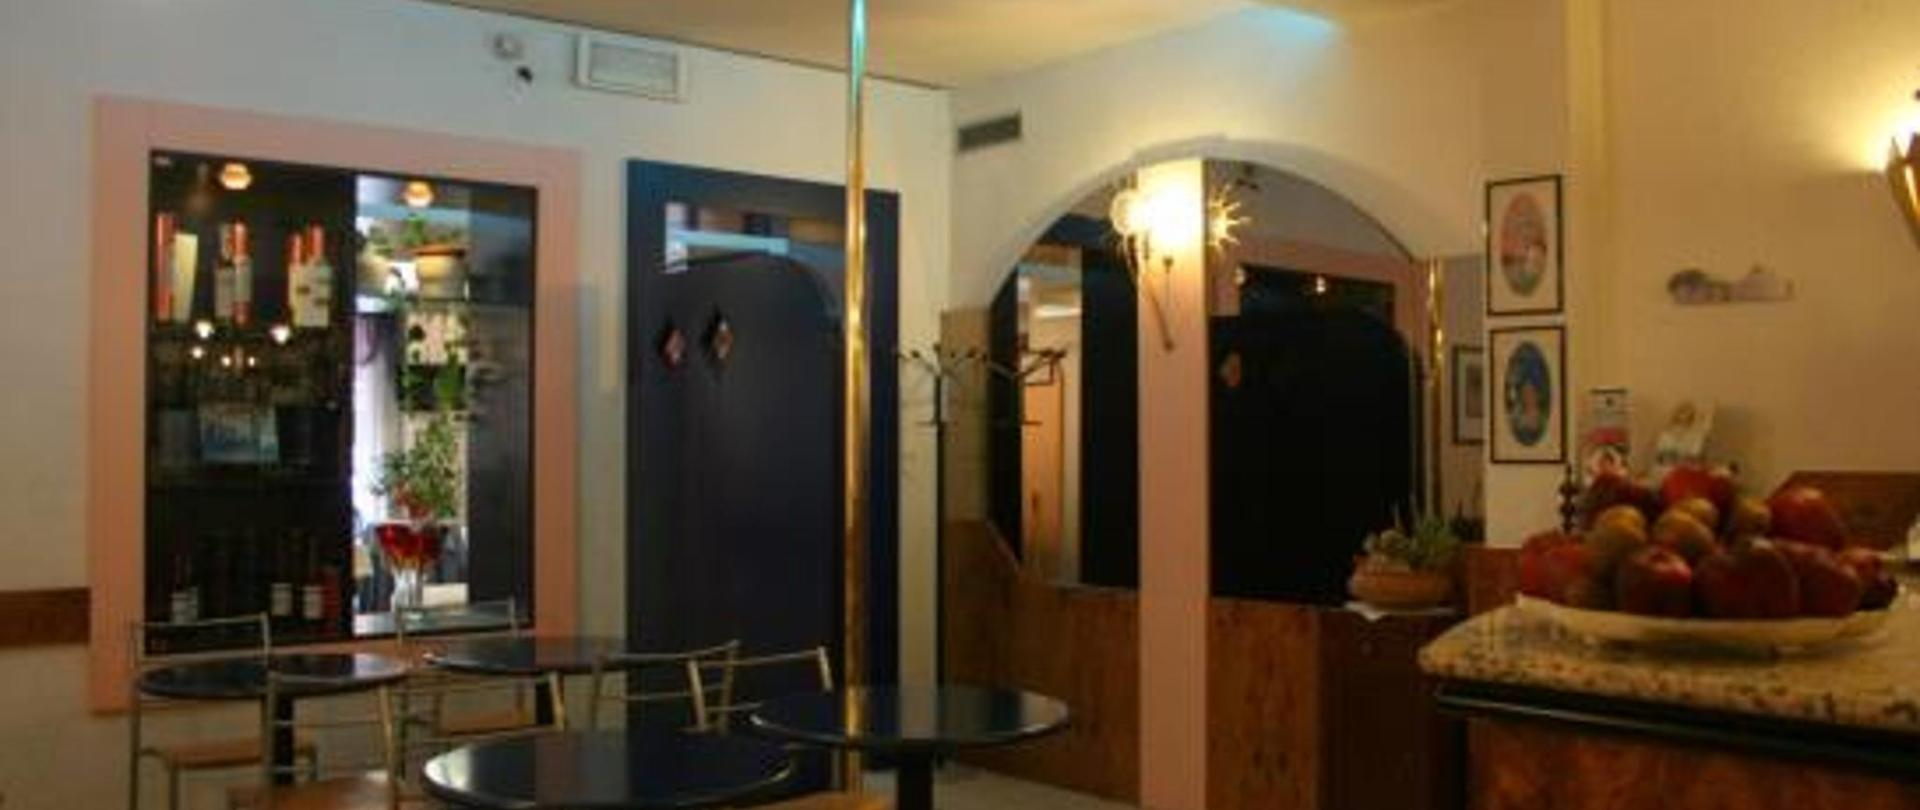 hotel-cristina-vicenza-022.jpg